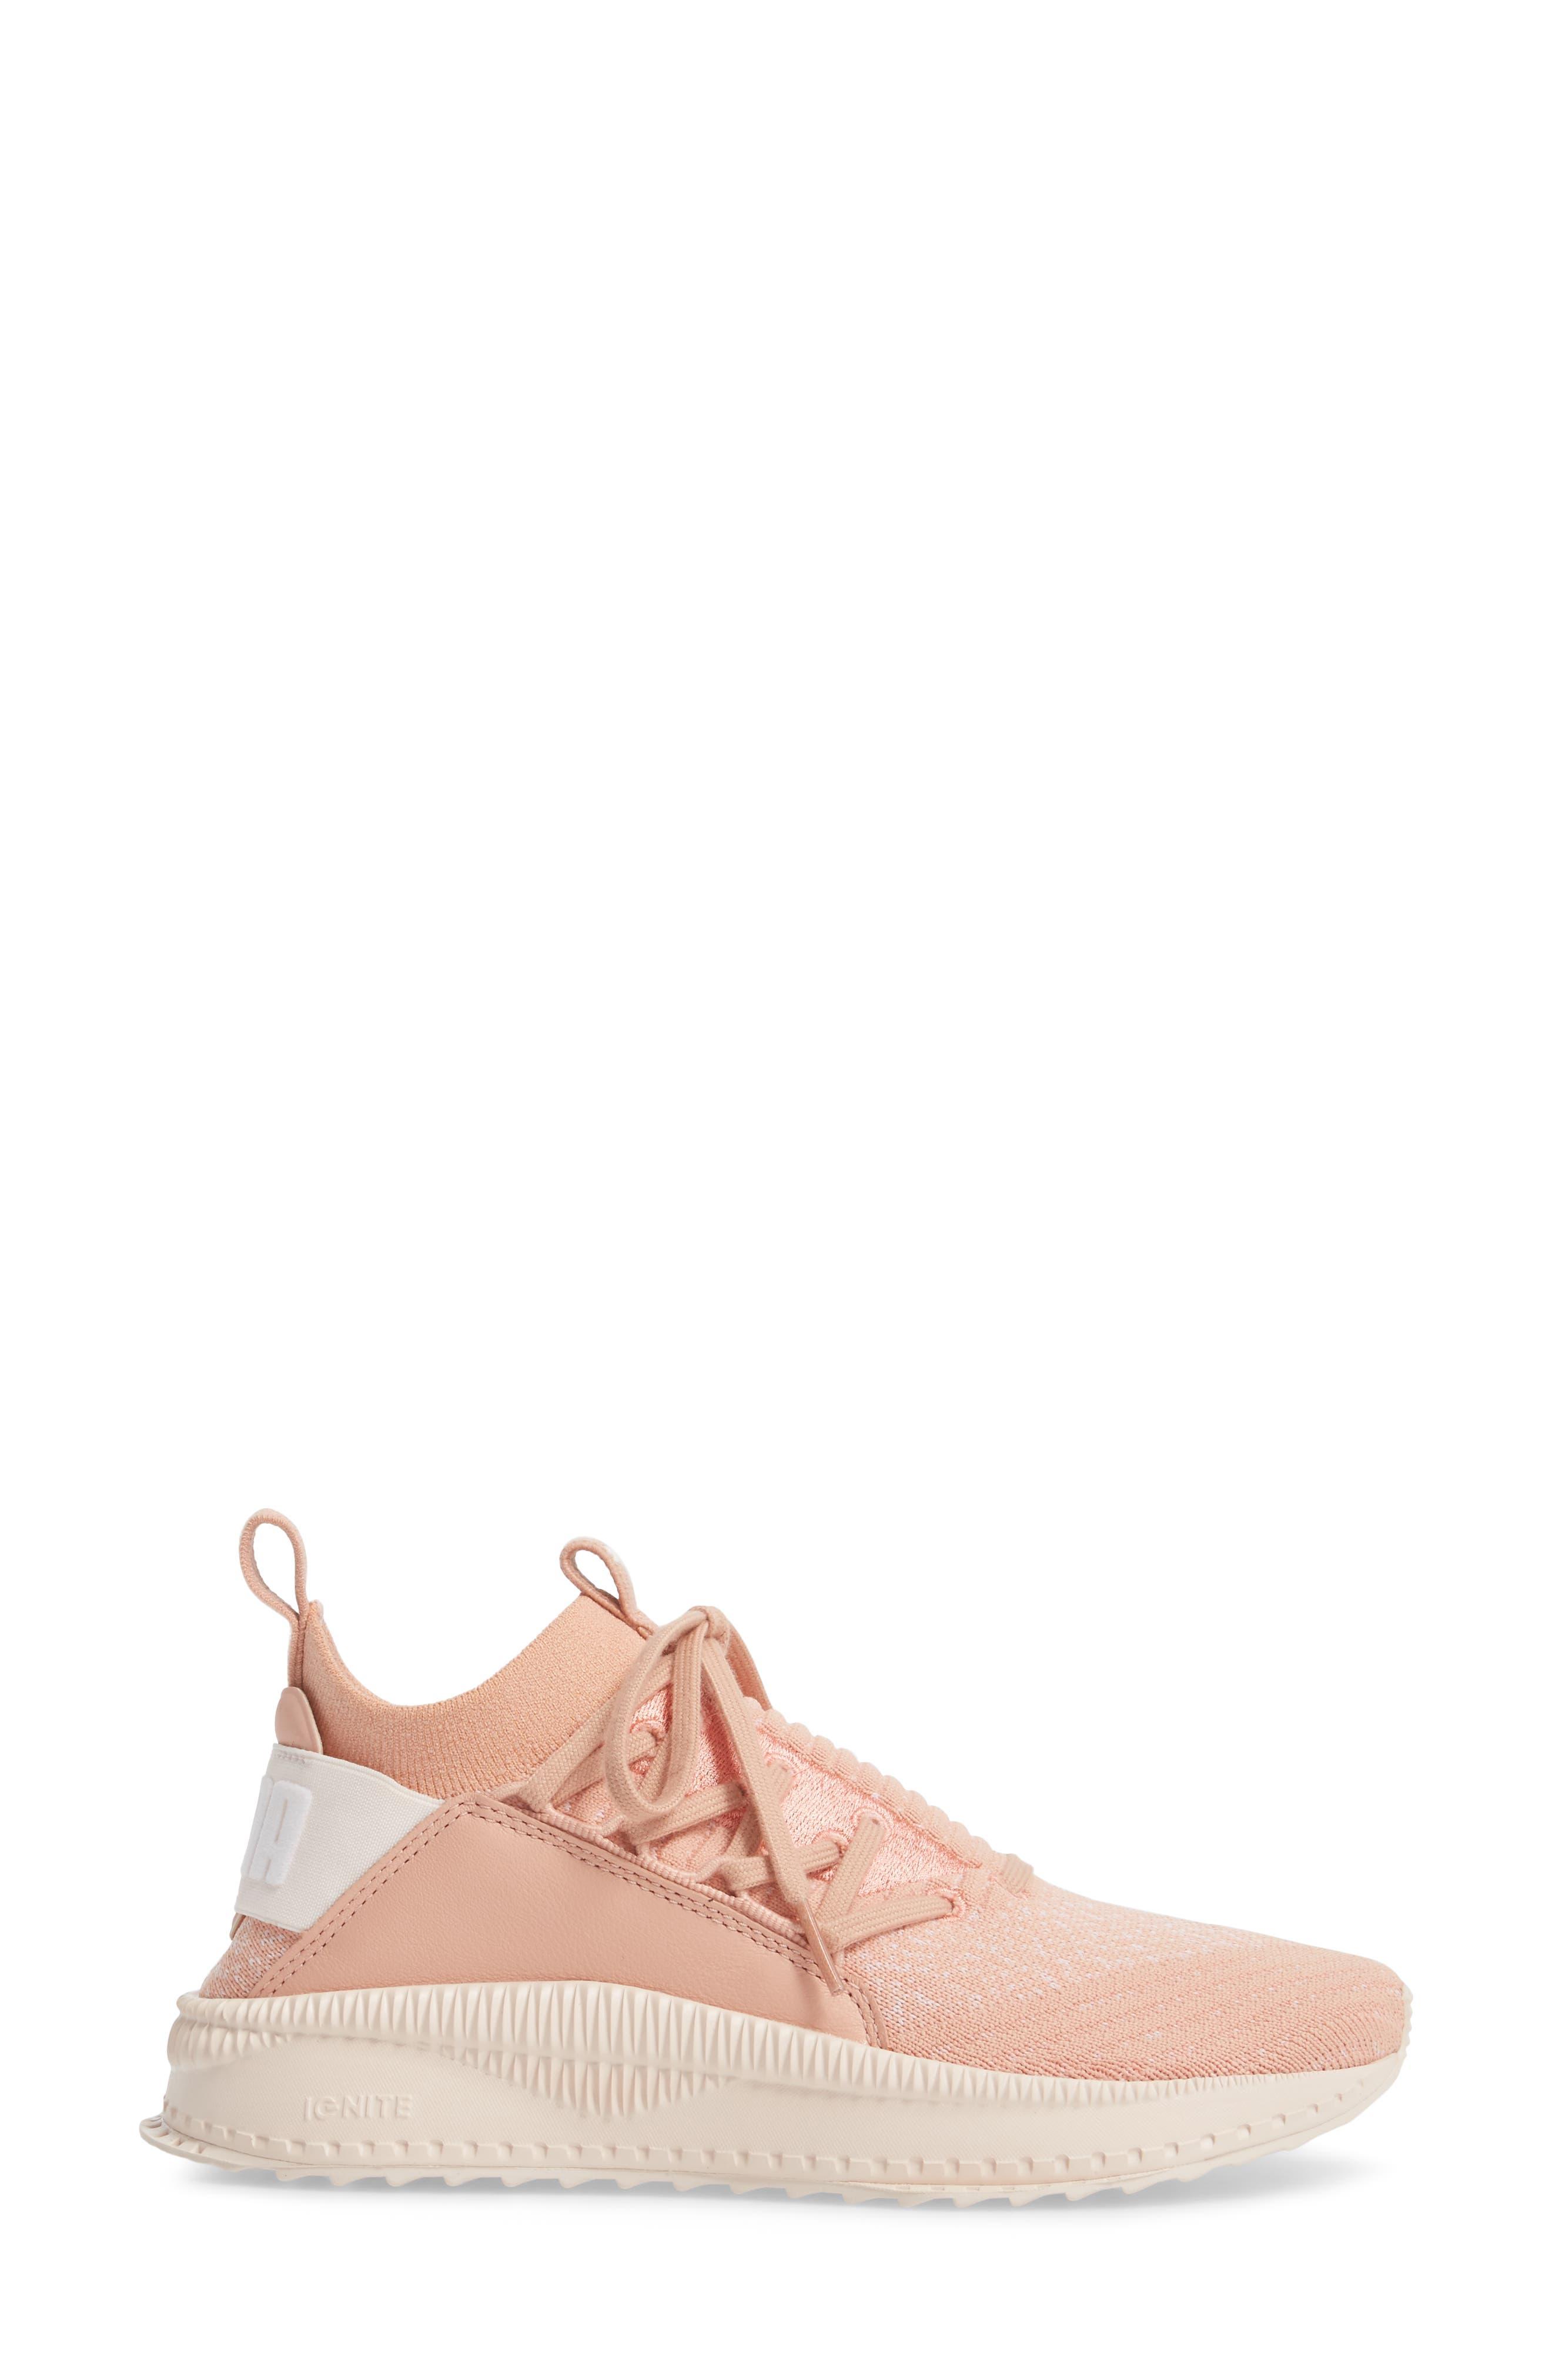 Tsugi Jun Knit Sneaker,                             Alternate thumbnail 3, color,                             Peach Beige/ Puma White/ Pearl